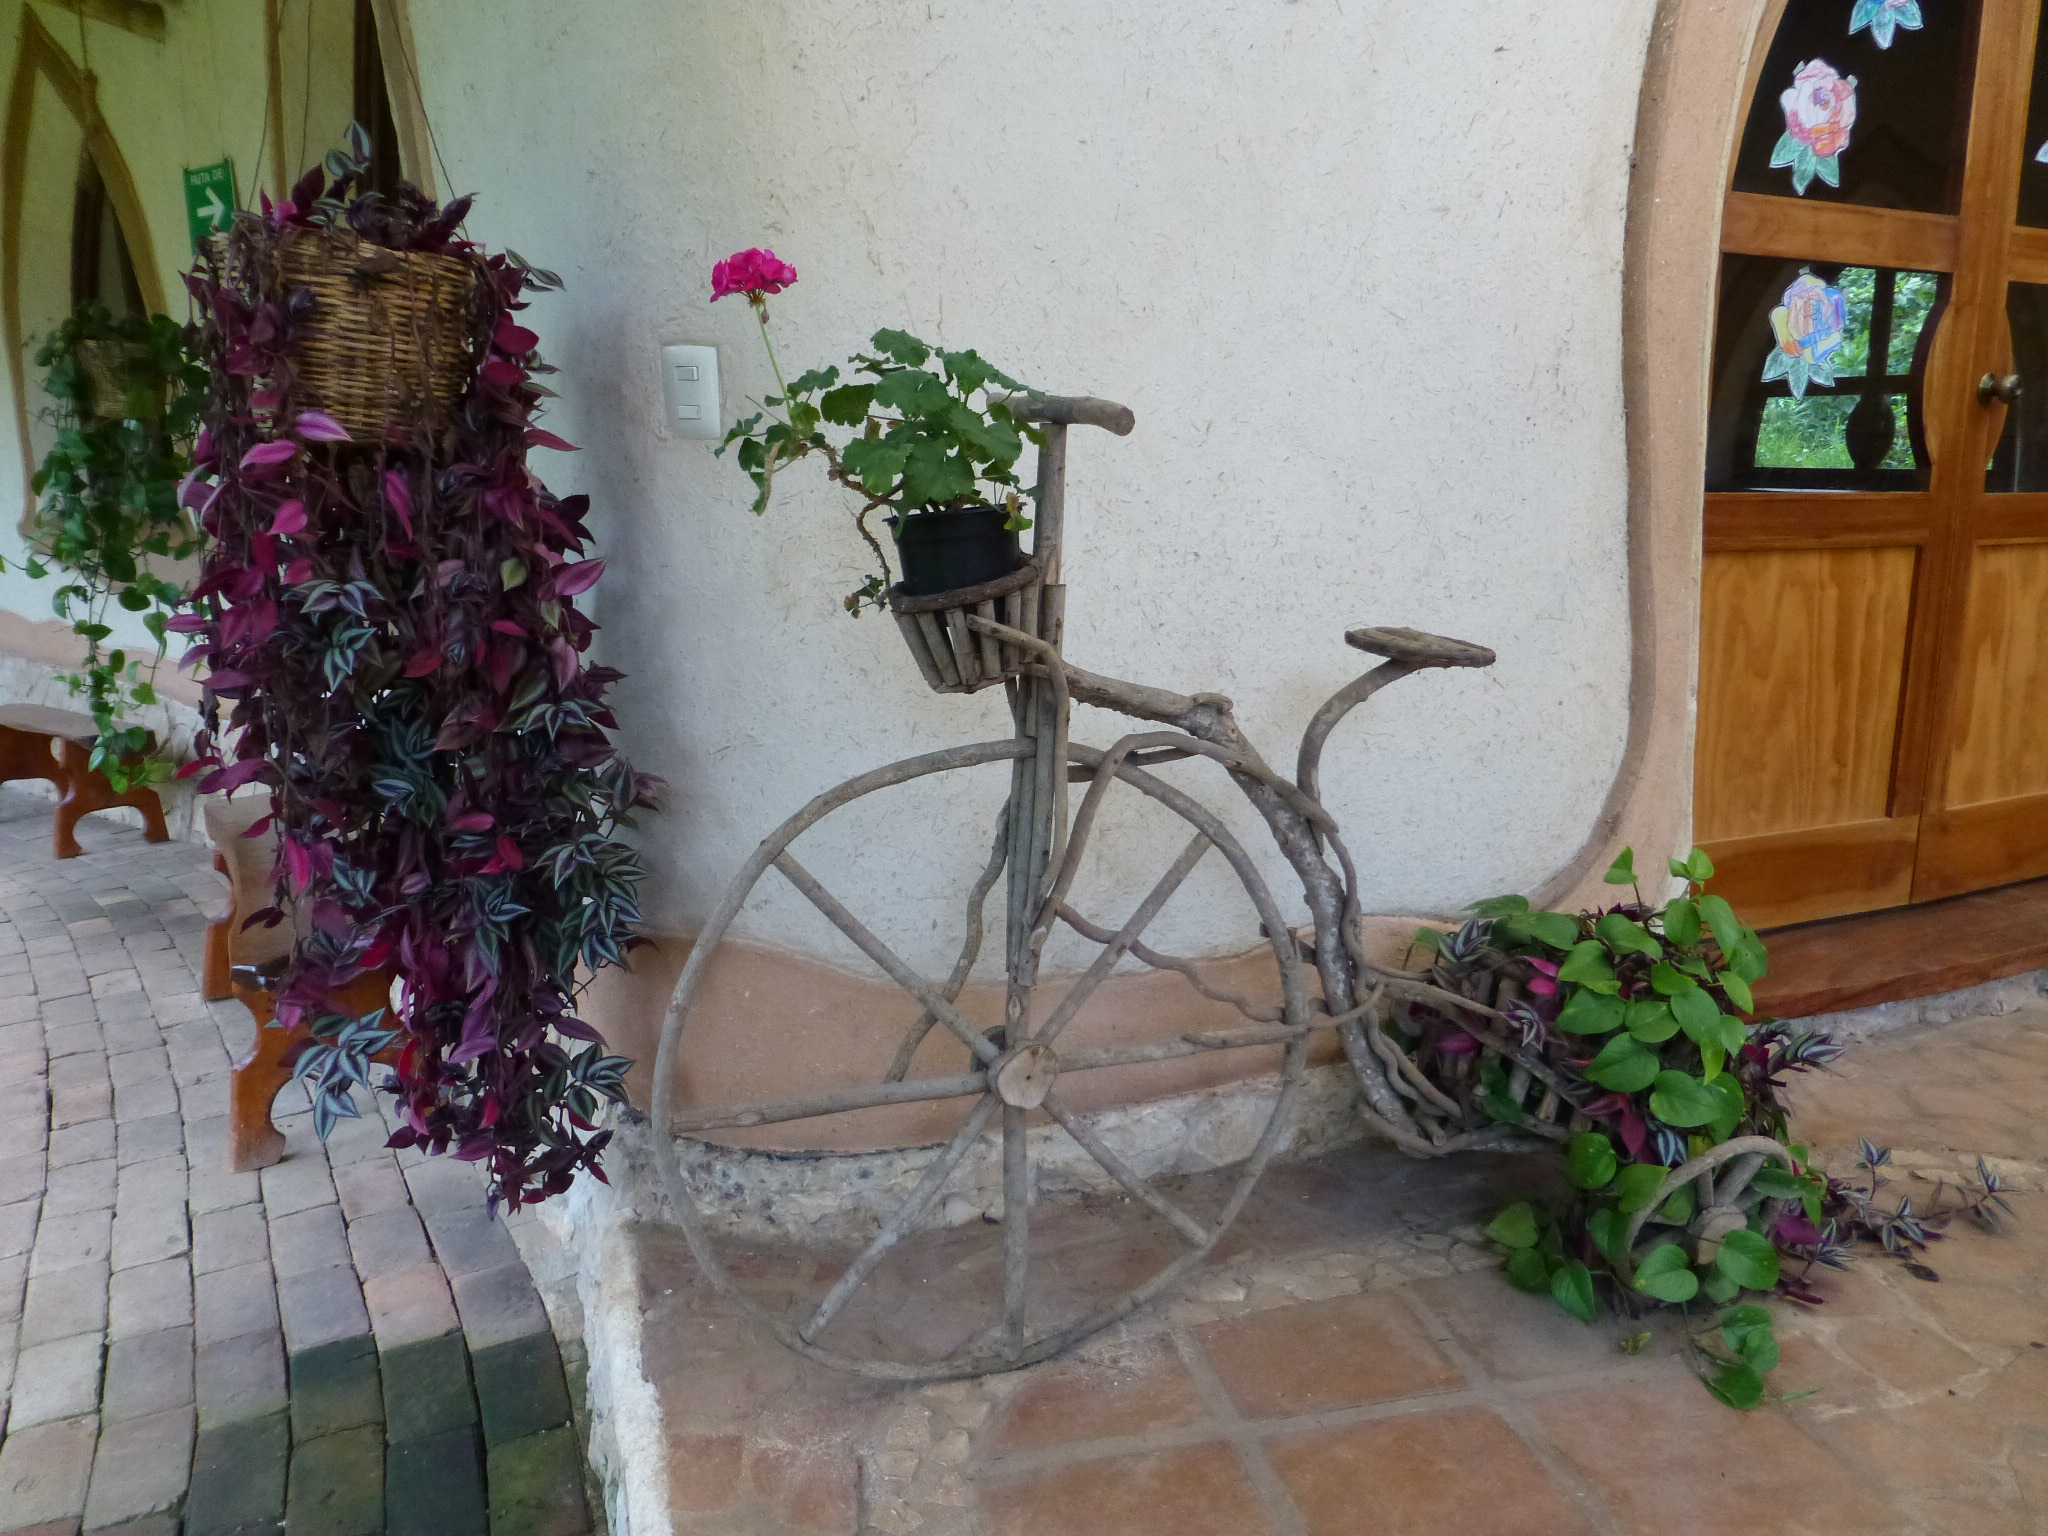 Bios lilla aprenderlachispa - Bicicleta macetero ...